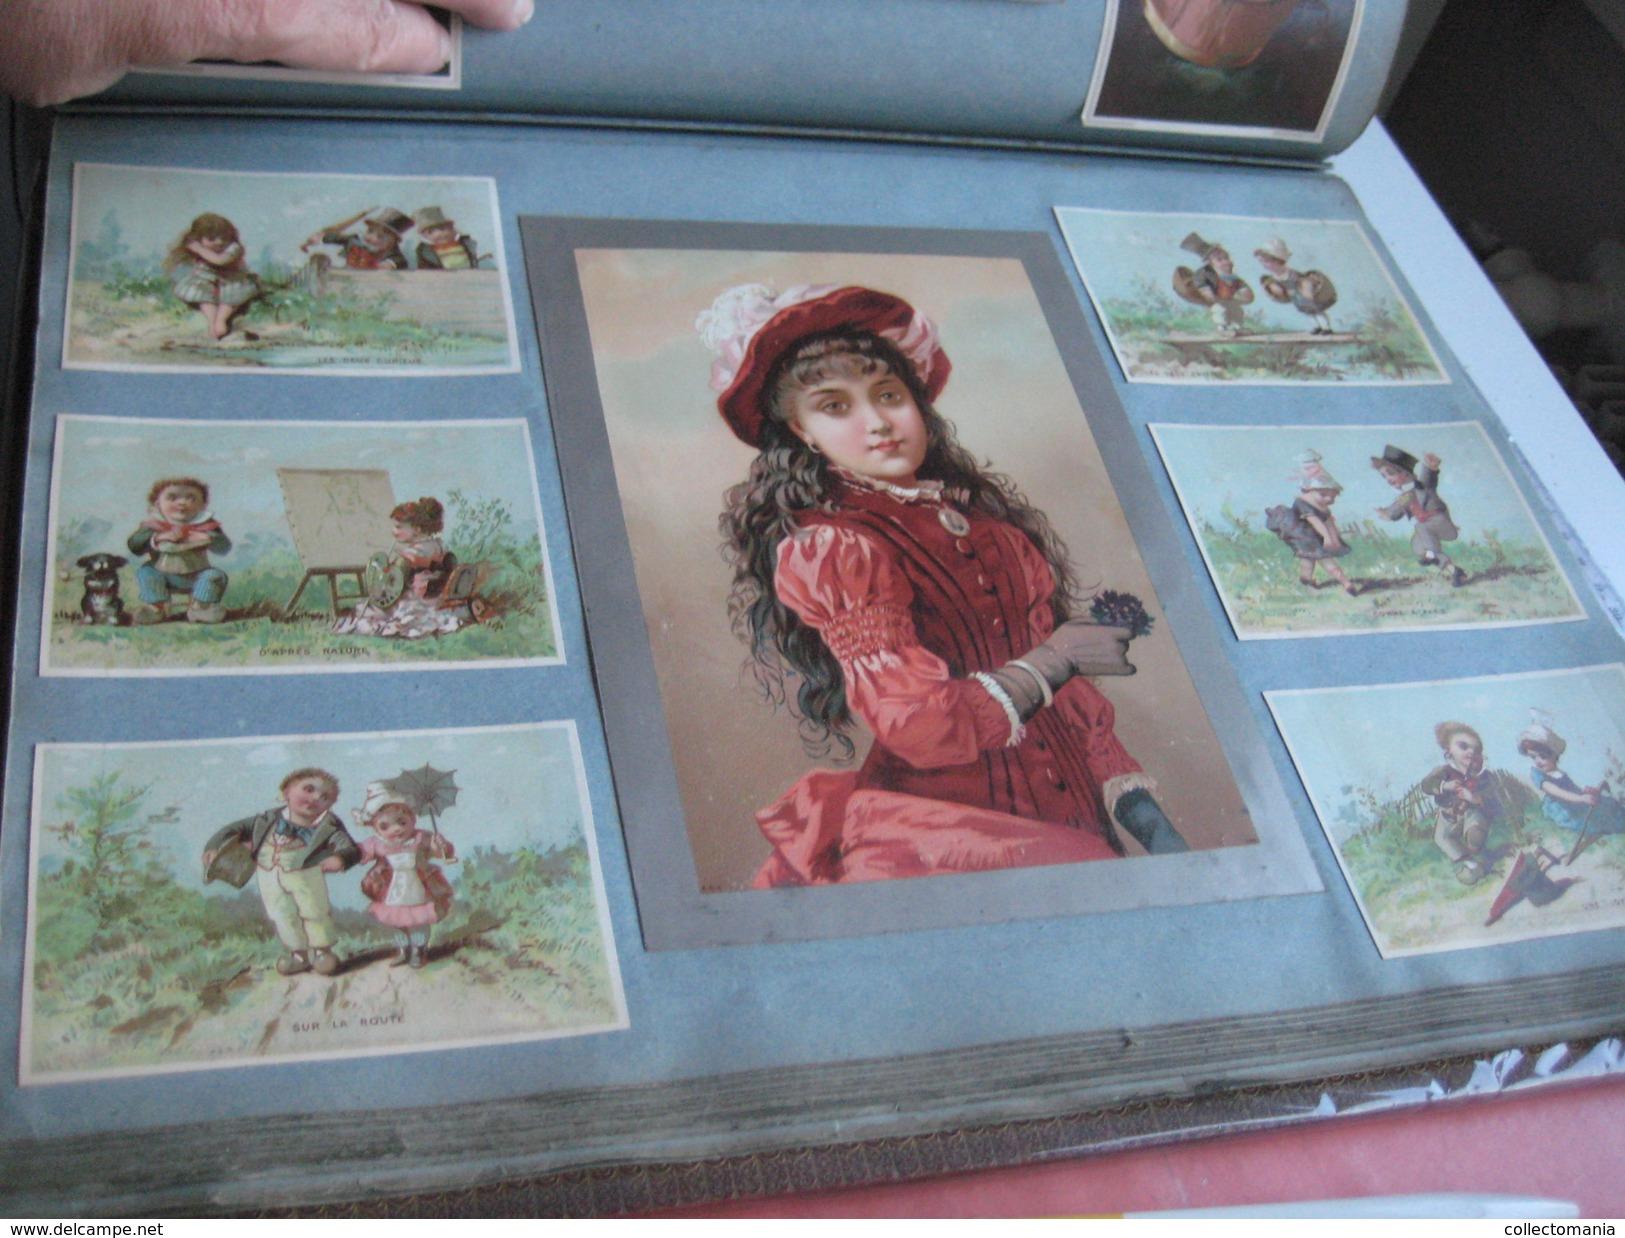 Old Thick Album 1000 Chromos Litho 1880 à 1885, All Splendid Condition, Evaluate The Scans, Many Topics, Superbe Grandes - Chromos